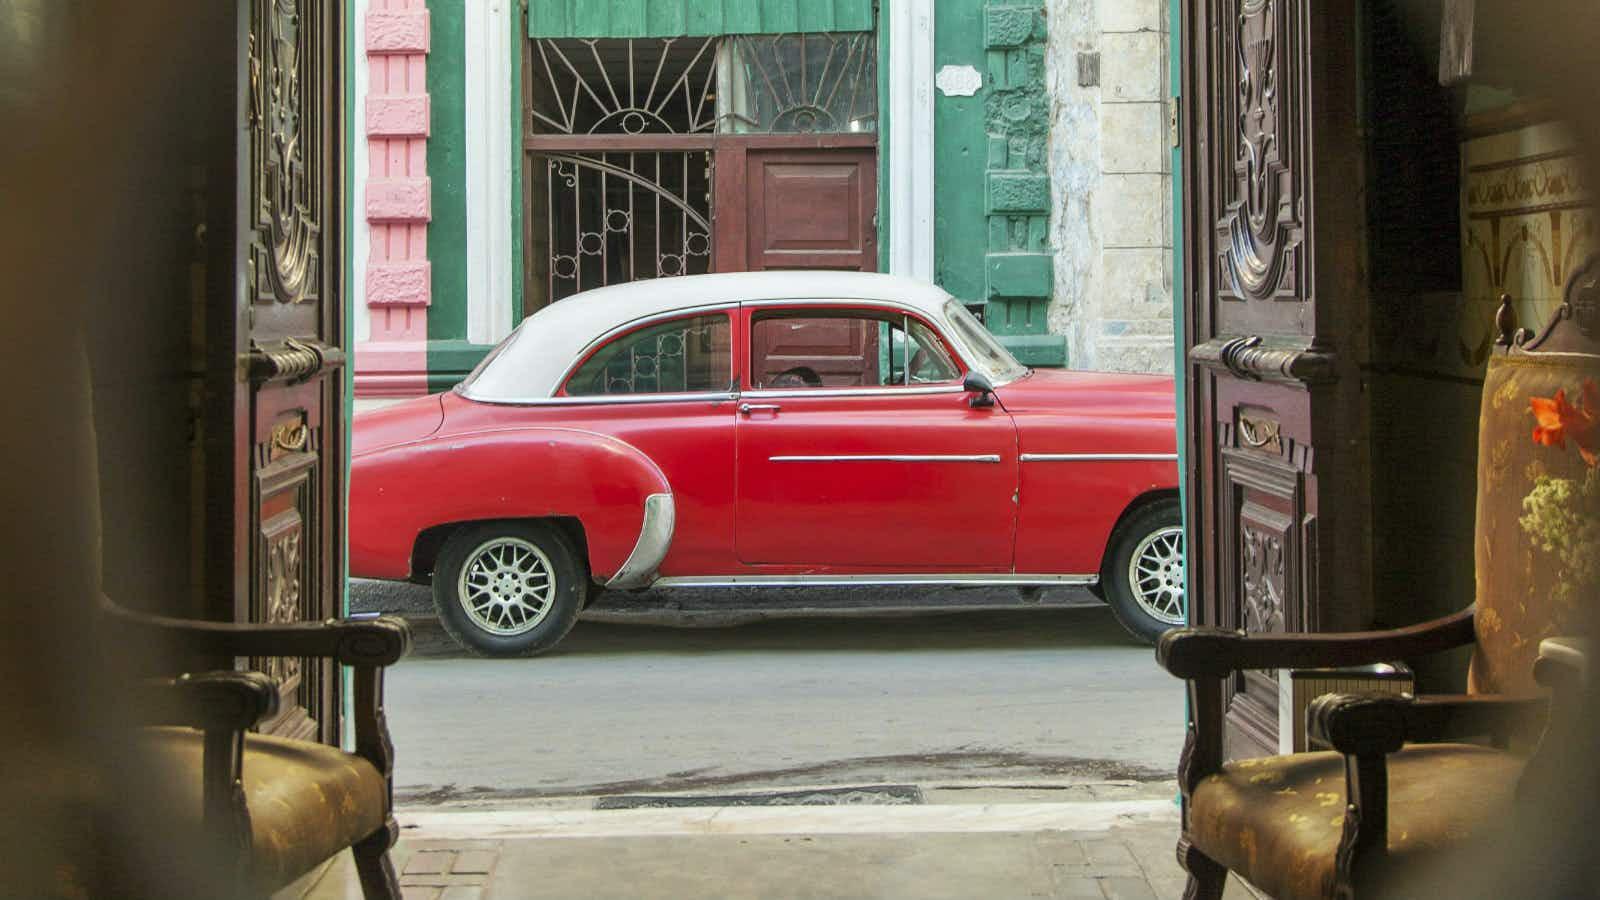 Behind Cuba's curtain: backstage Havana